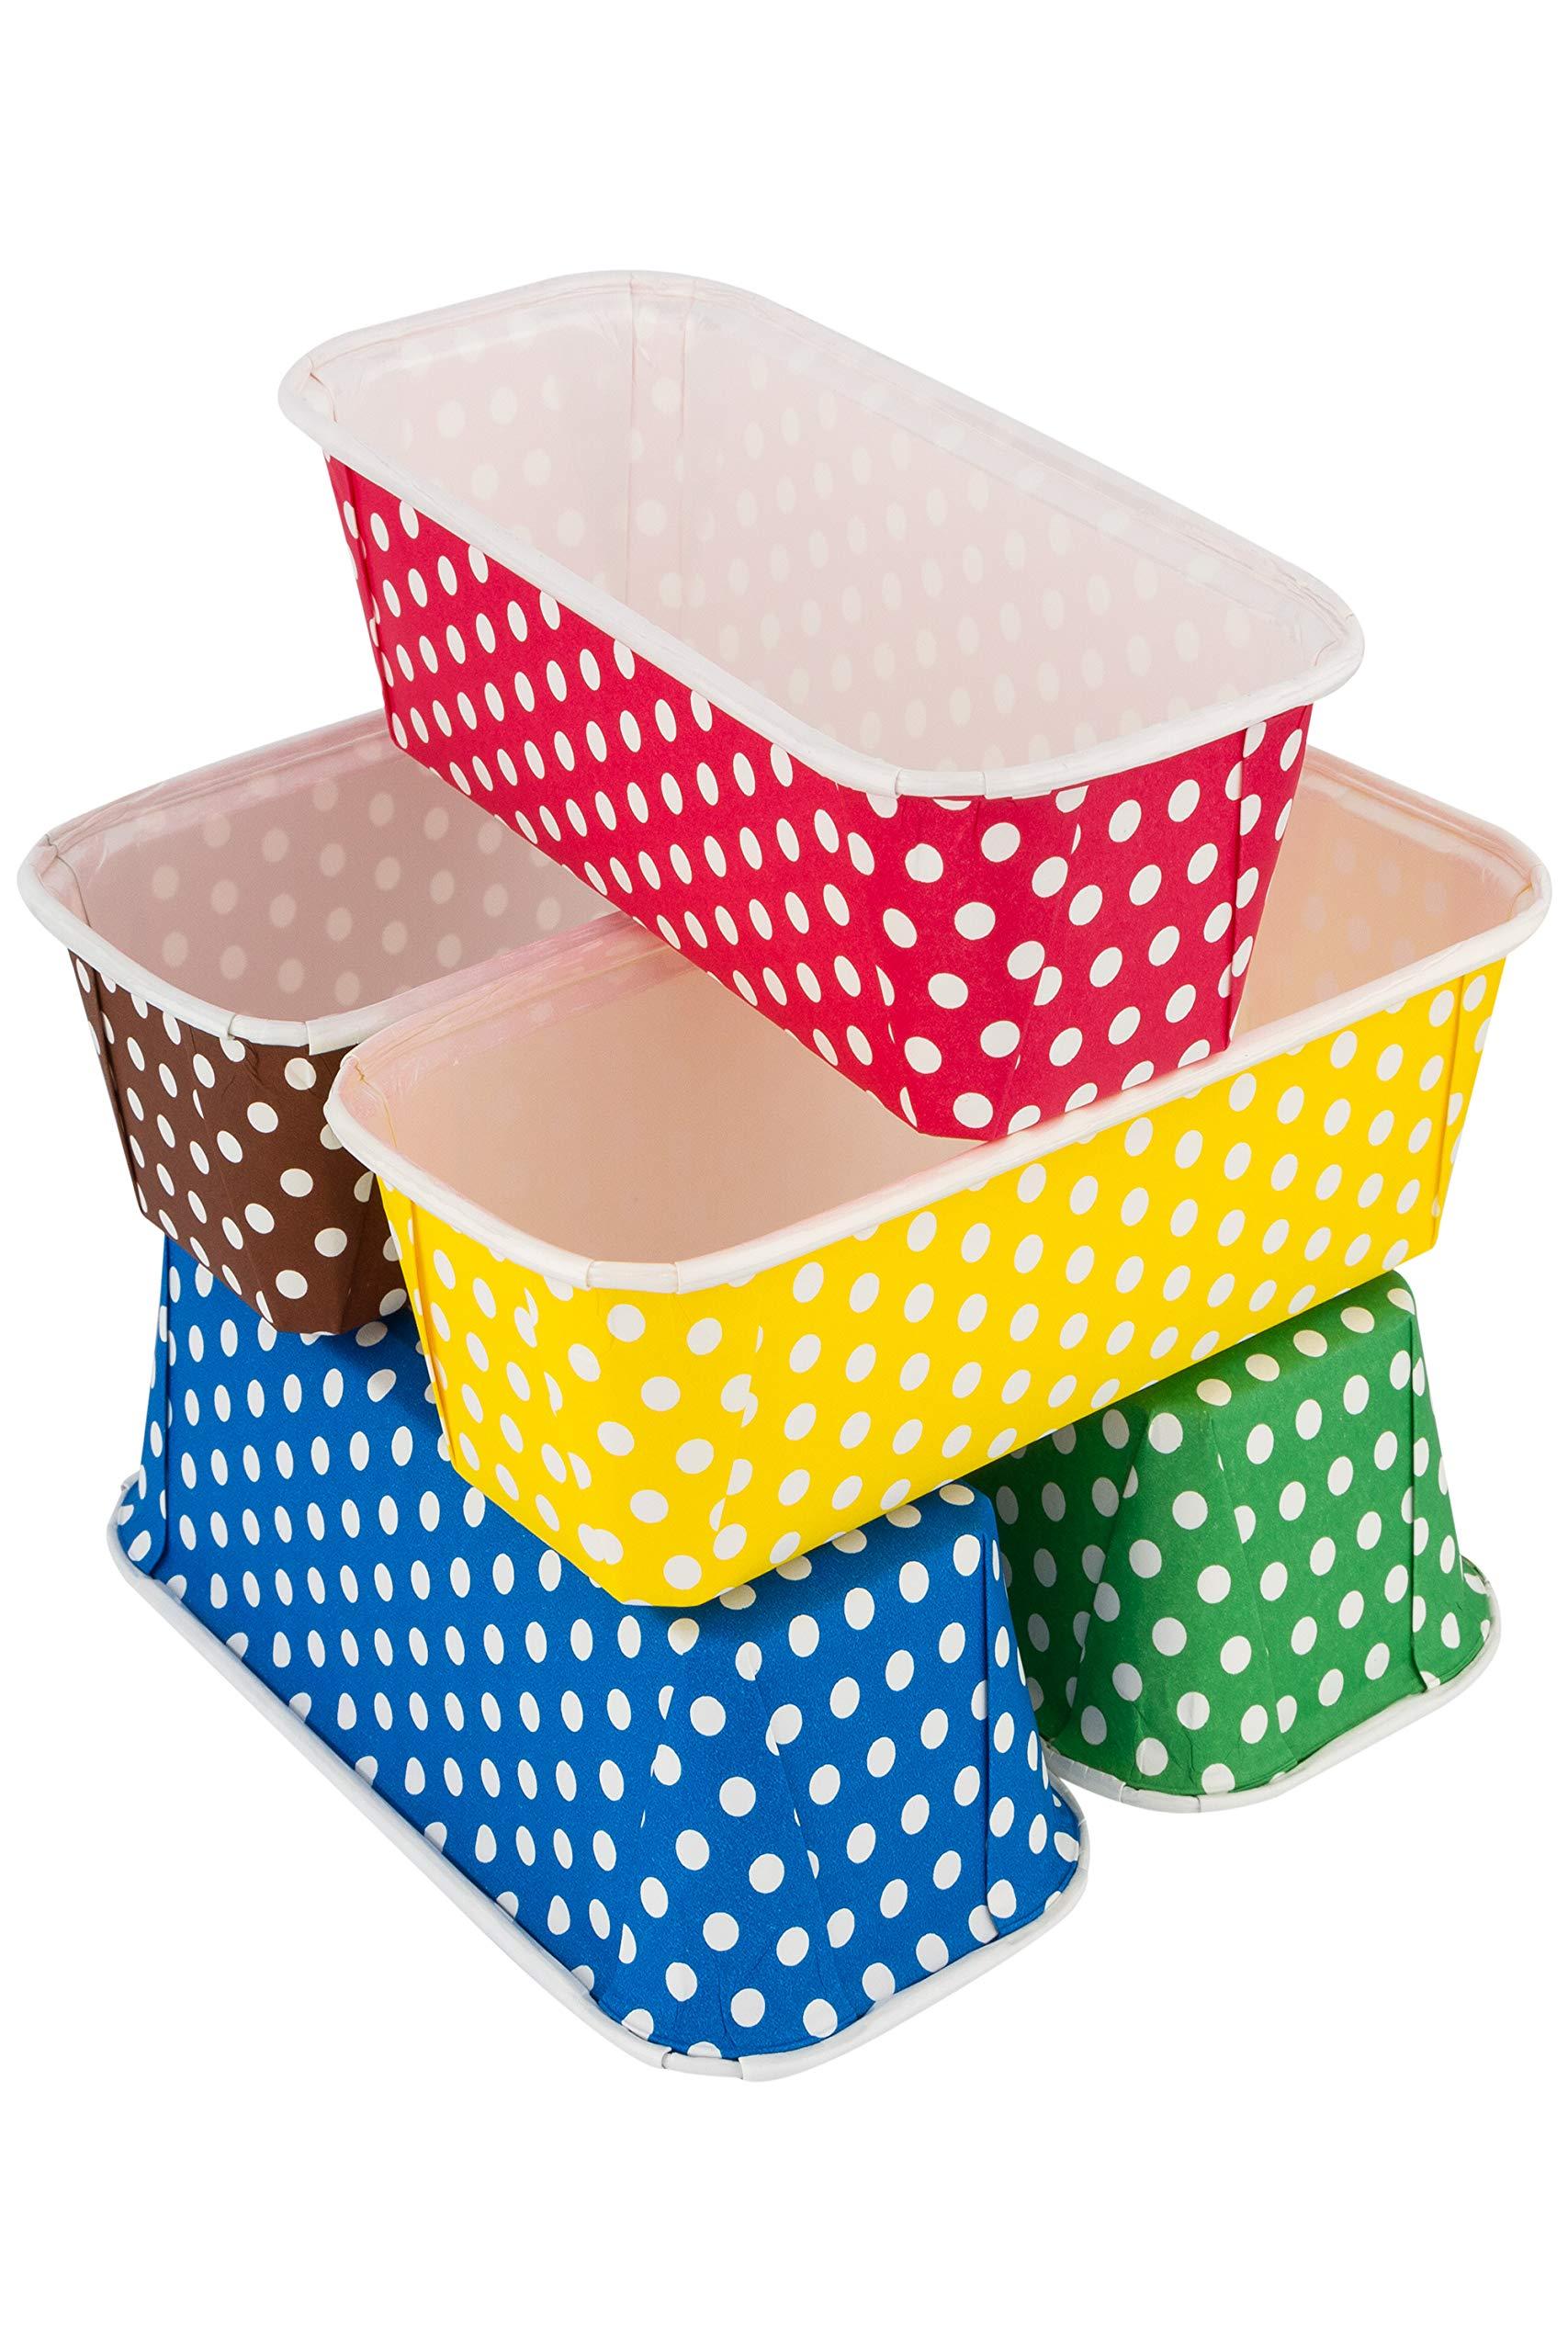 Paper Loaf Pans for Baking, 25 Loaf Pan Liners, 7x3x2 Mini Pie Pans, Brown Tart Pan Color by PETANI by PETANI